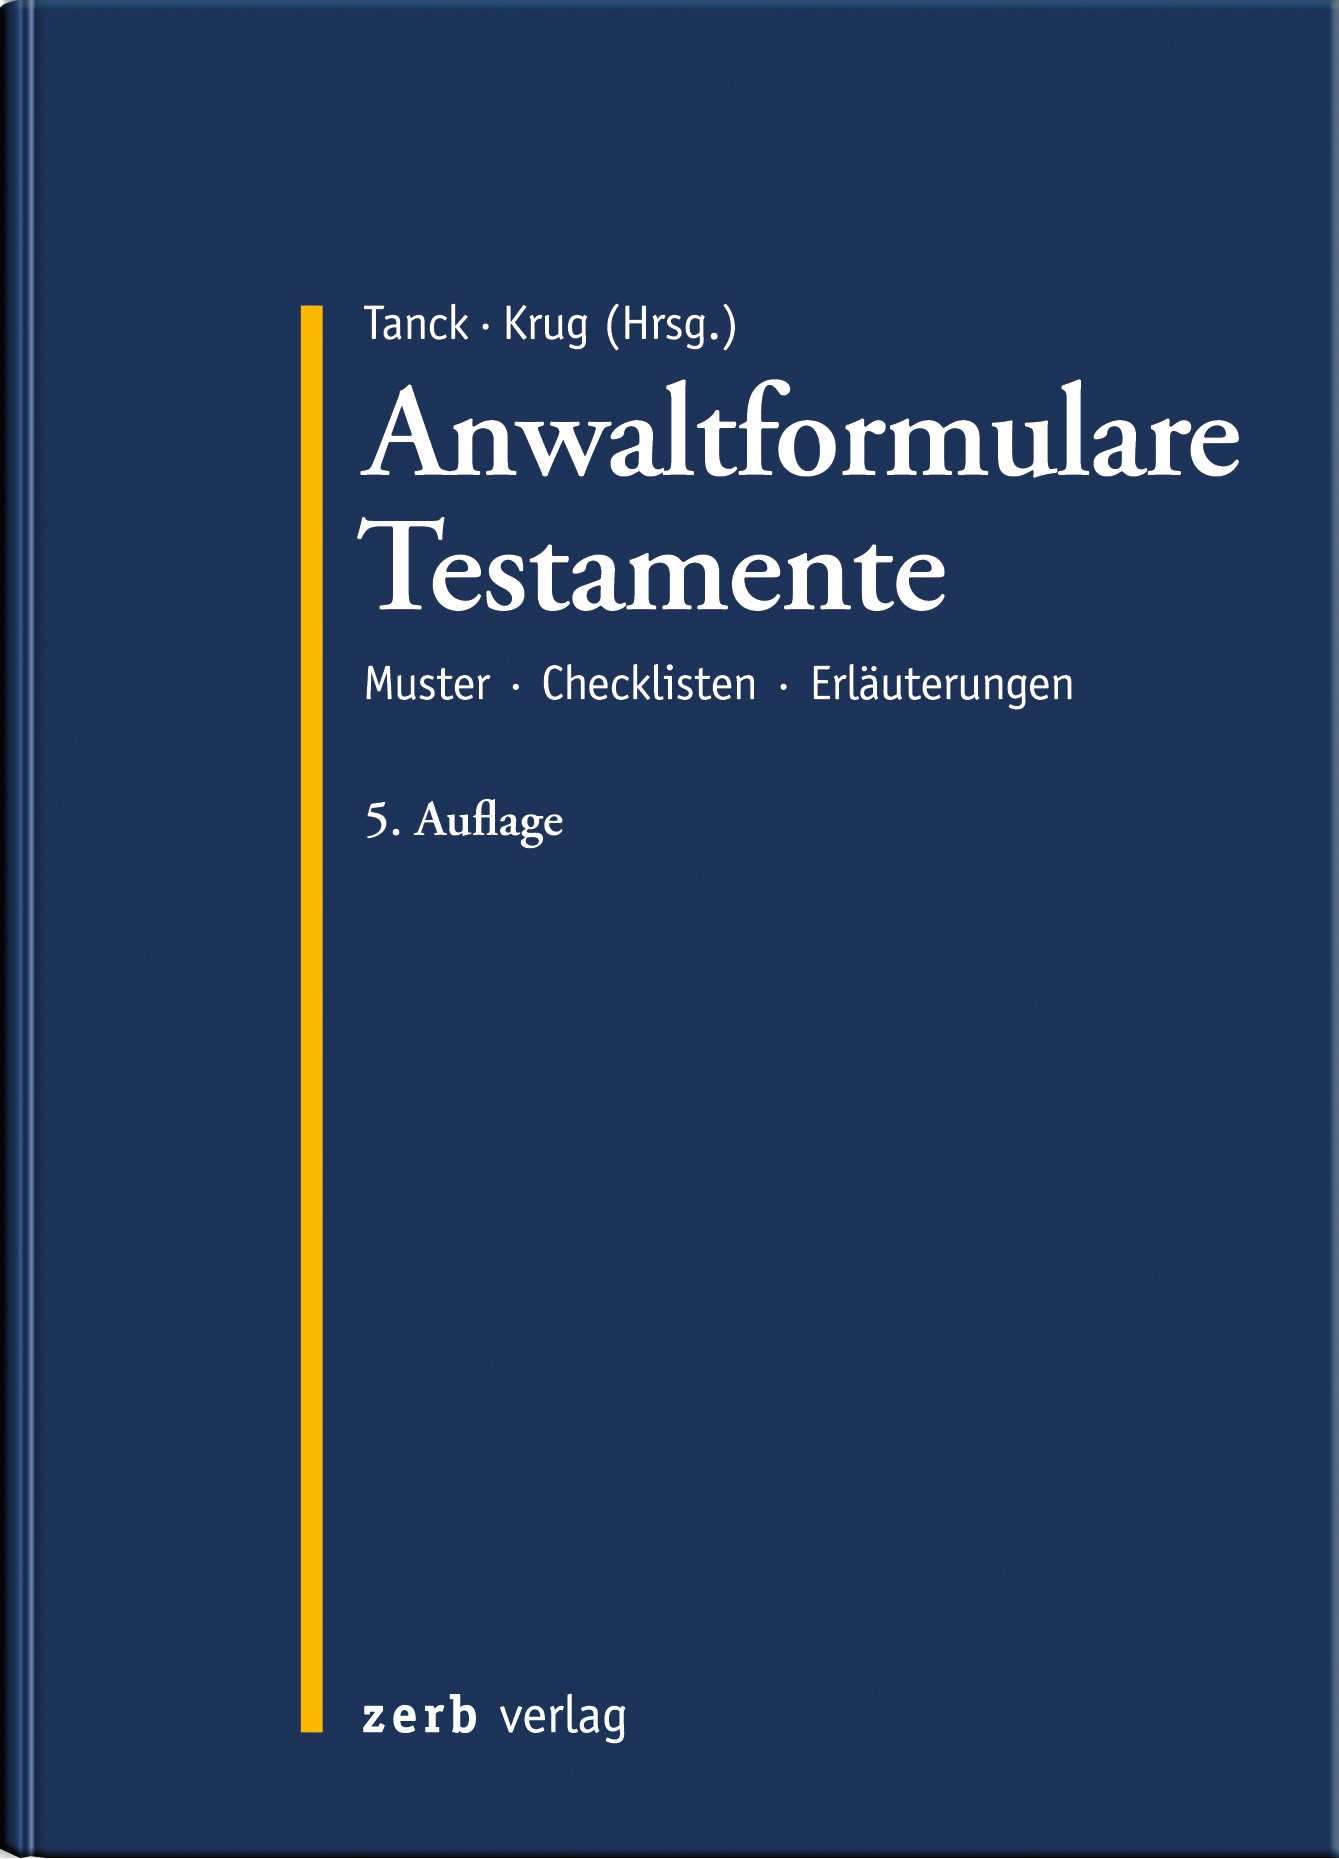 Anwaltformulare Testamente | Tanck / Krug (Hrsg.) | 5. Auflage, 2015 (Cover)